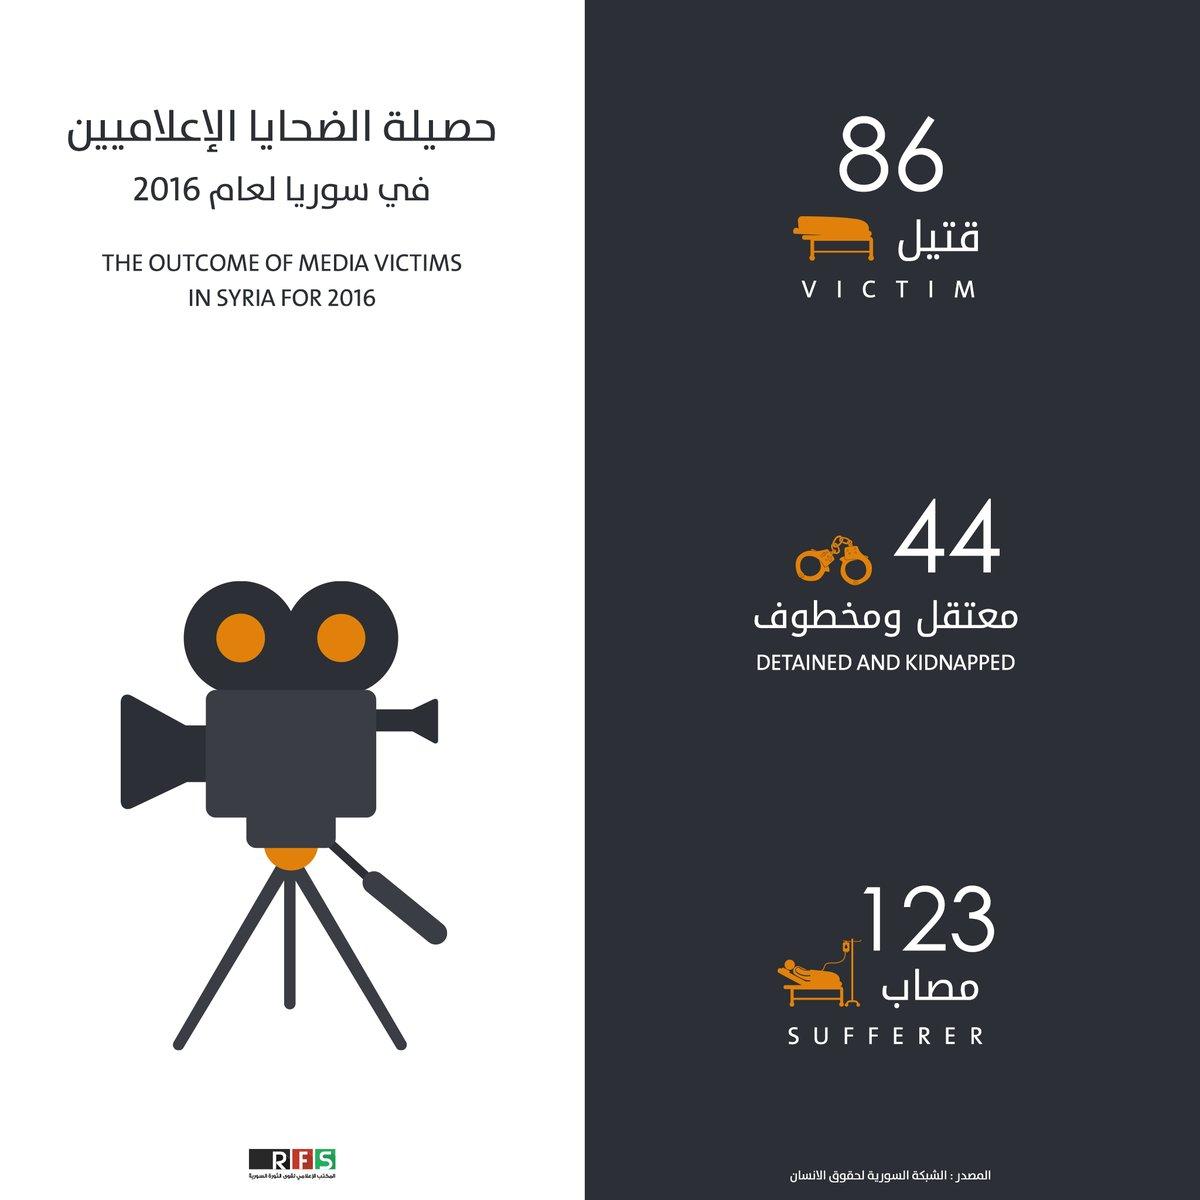 مقتل 86 إعلامياً وجرح 123 آخرين خلال عام 2016